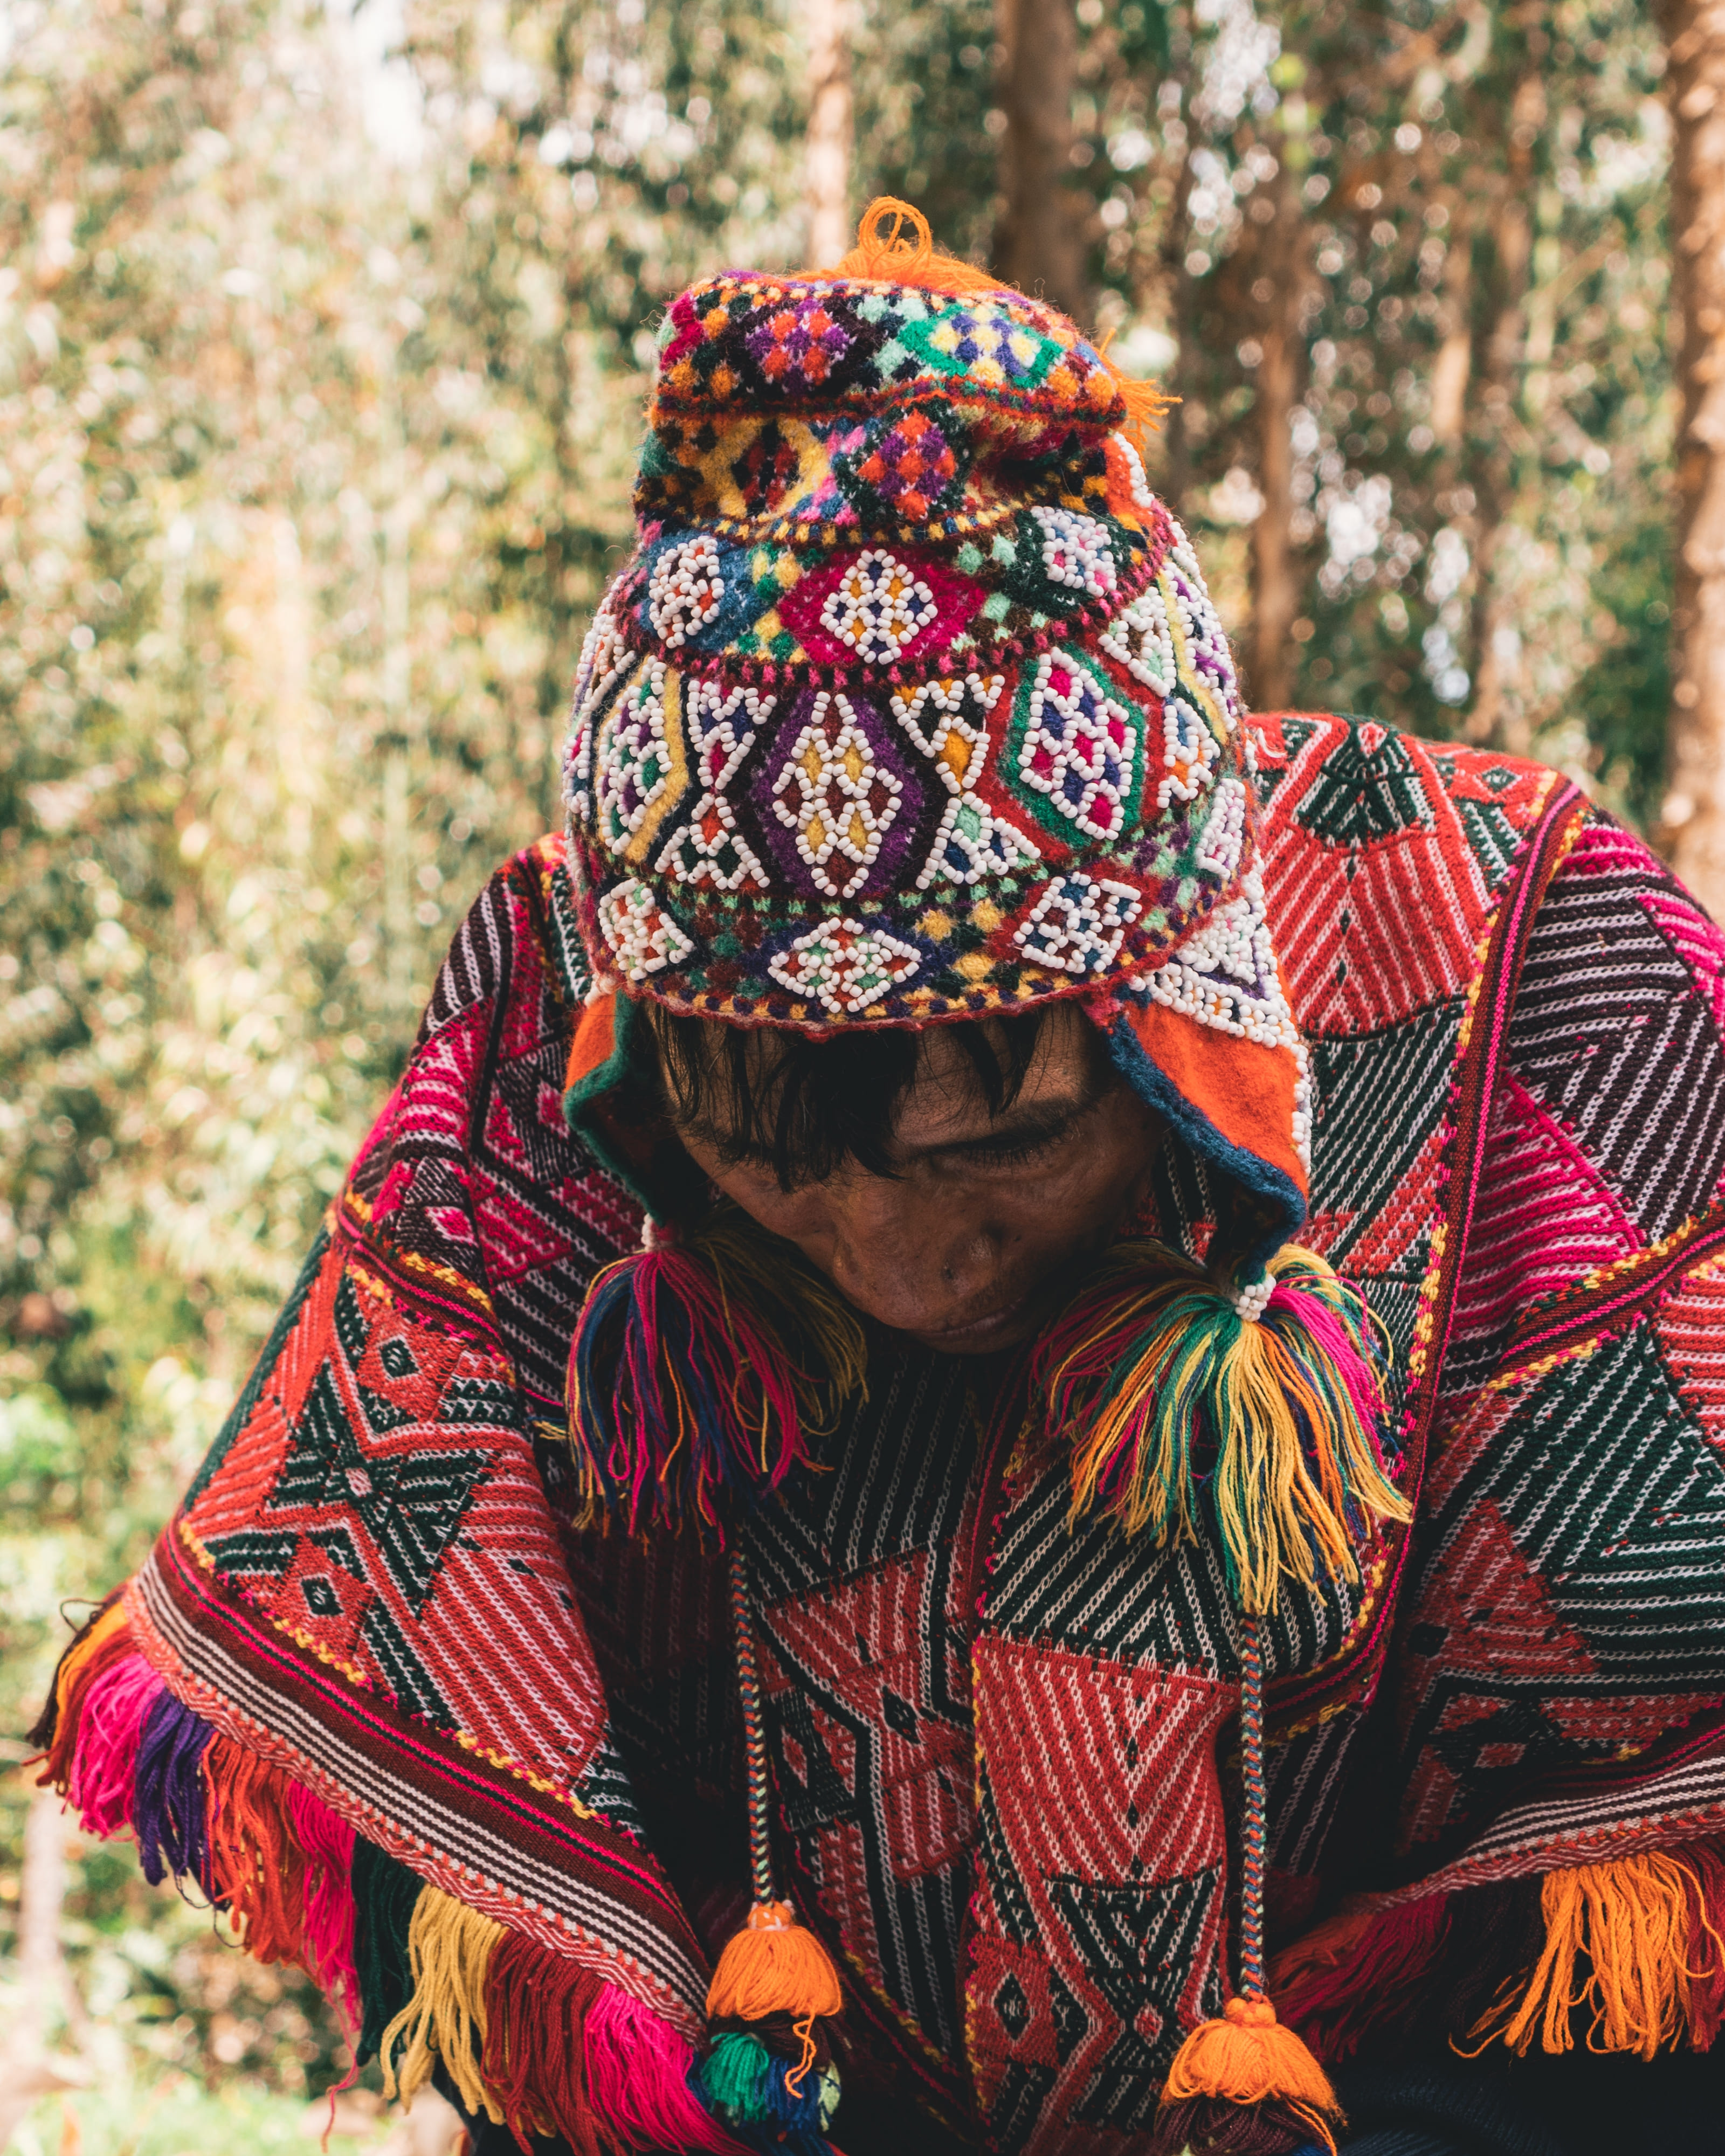 ayahuasca, psilocybin, 5 meo-dmt wellness retreats for leaders, exectives